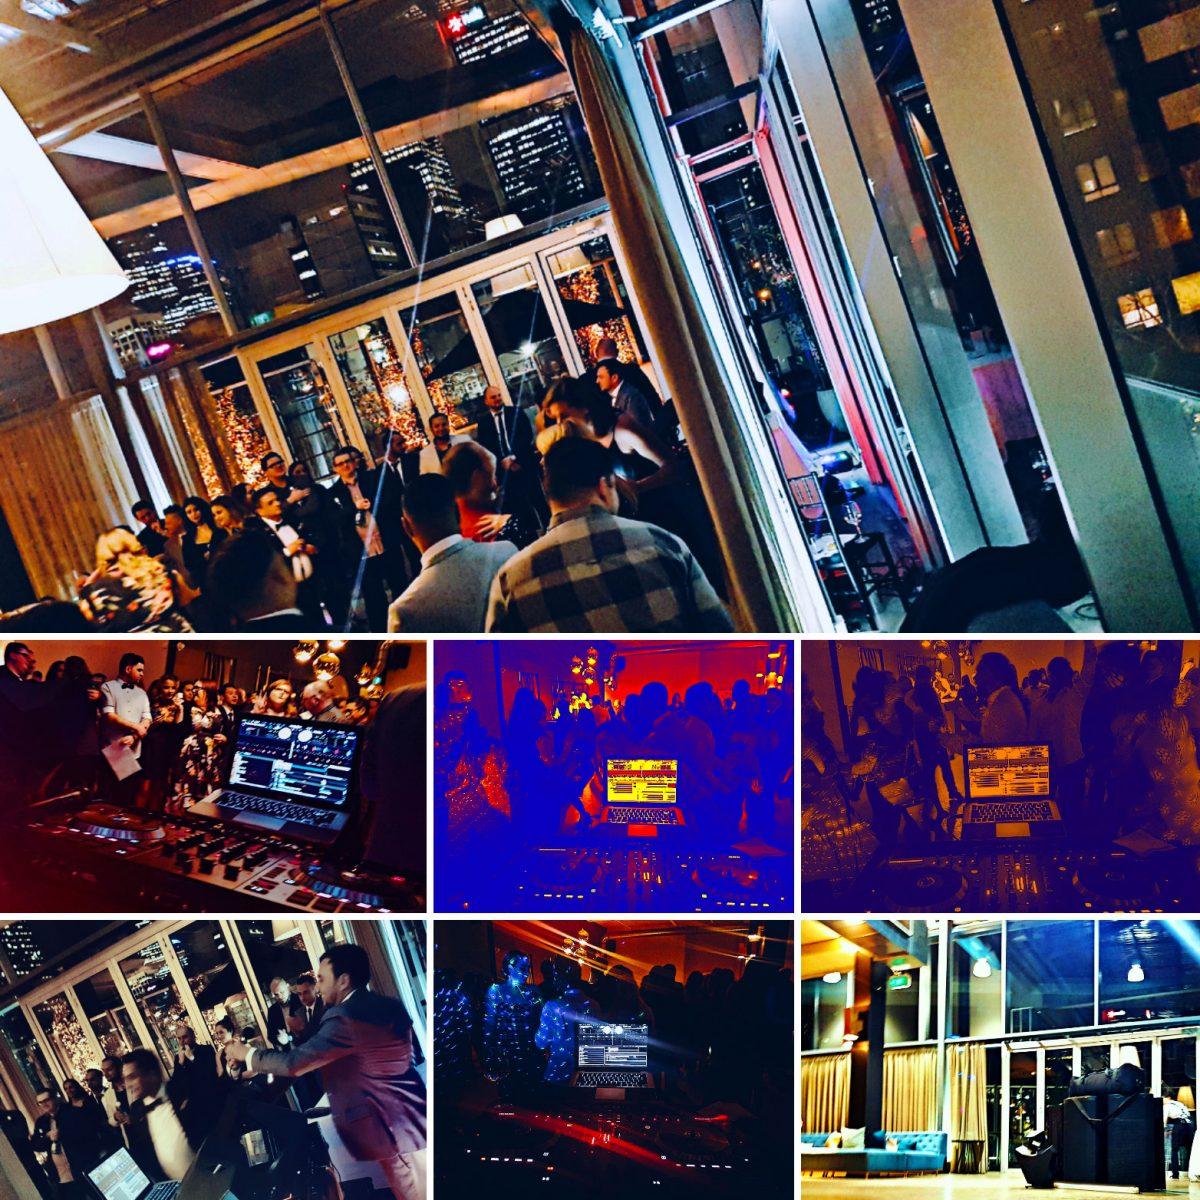 DJ-Kwenda-Alto-Event-Space-cnr-elizabethbourke-streets-melbourne-idjs-events-hire-1200x1200.jpg